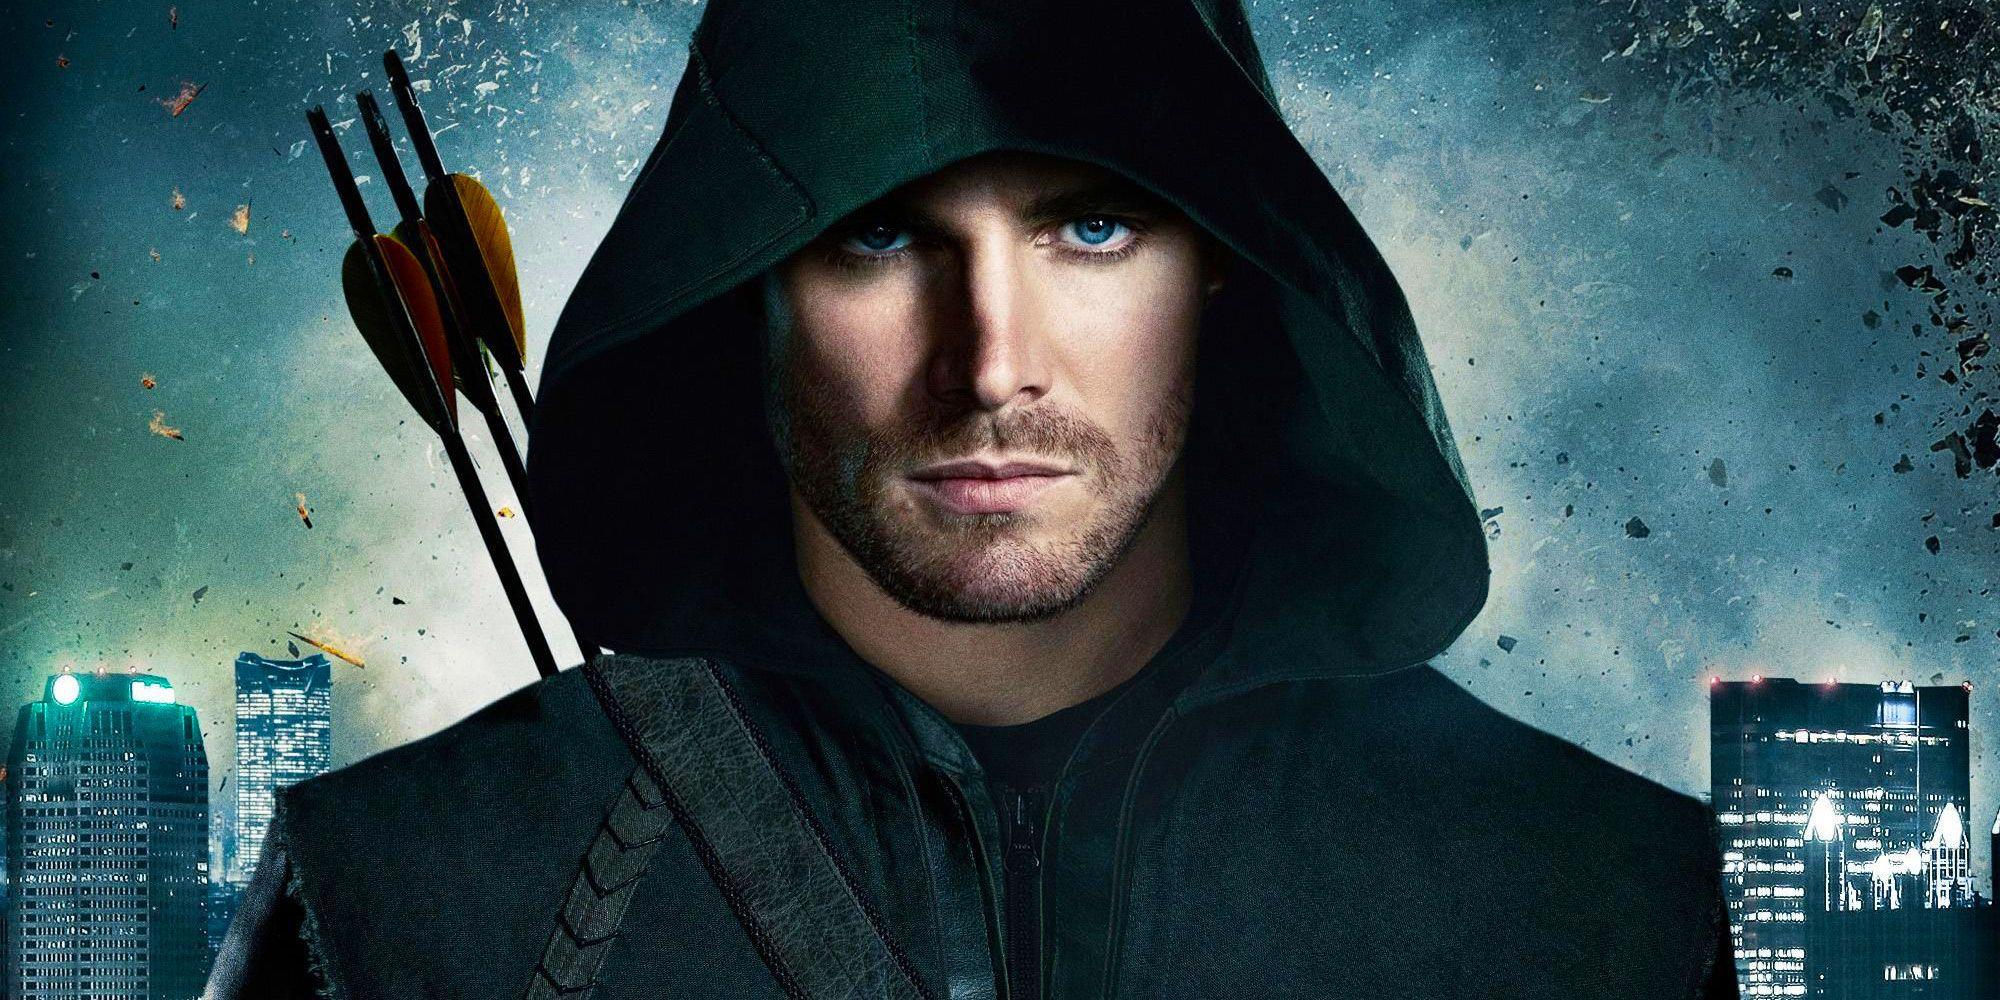 Stephen Amell Lands First Post-Arrow TV Project | CBR